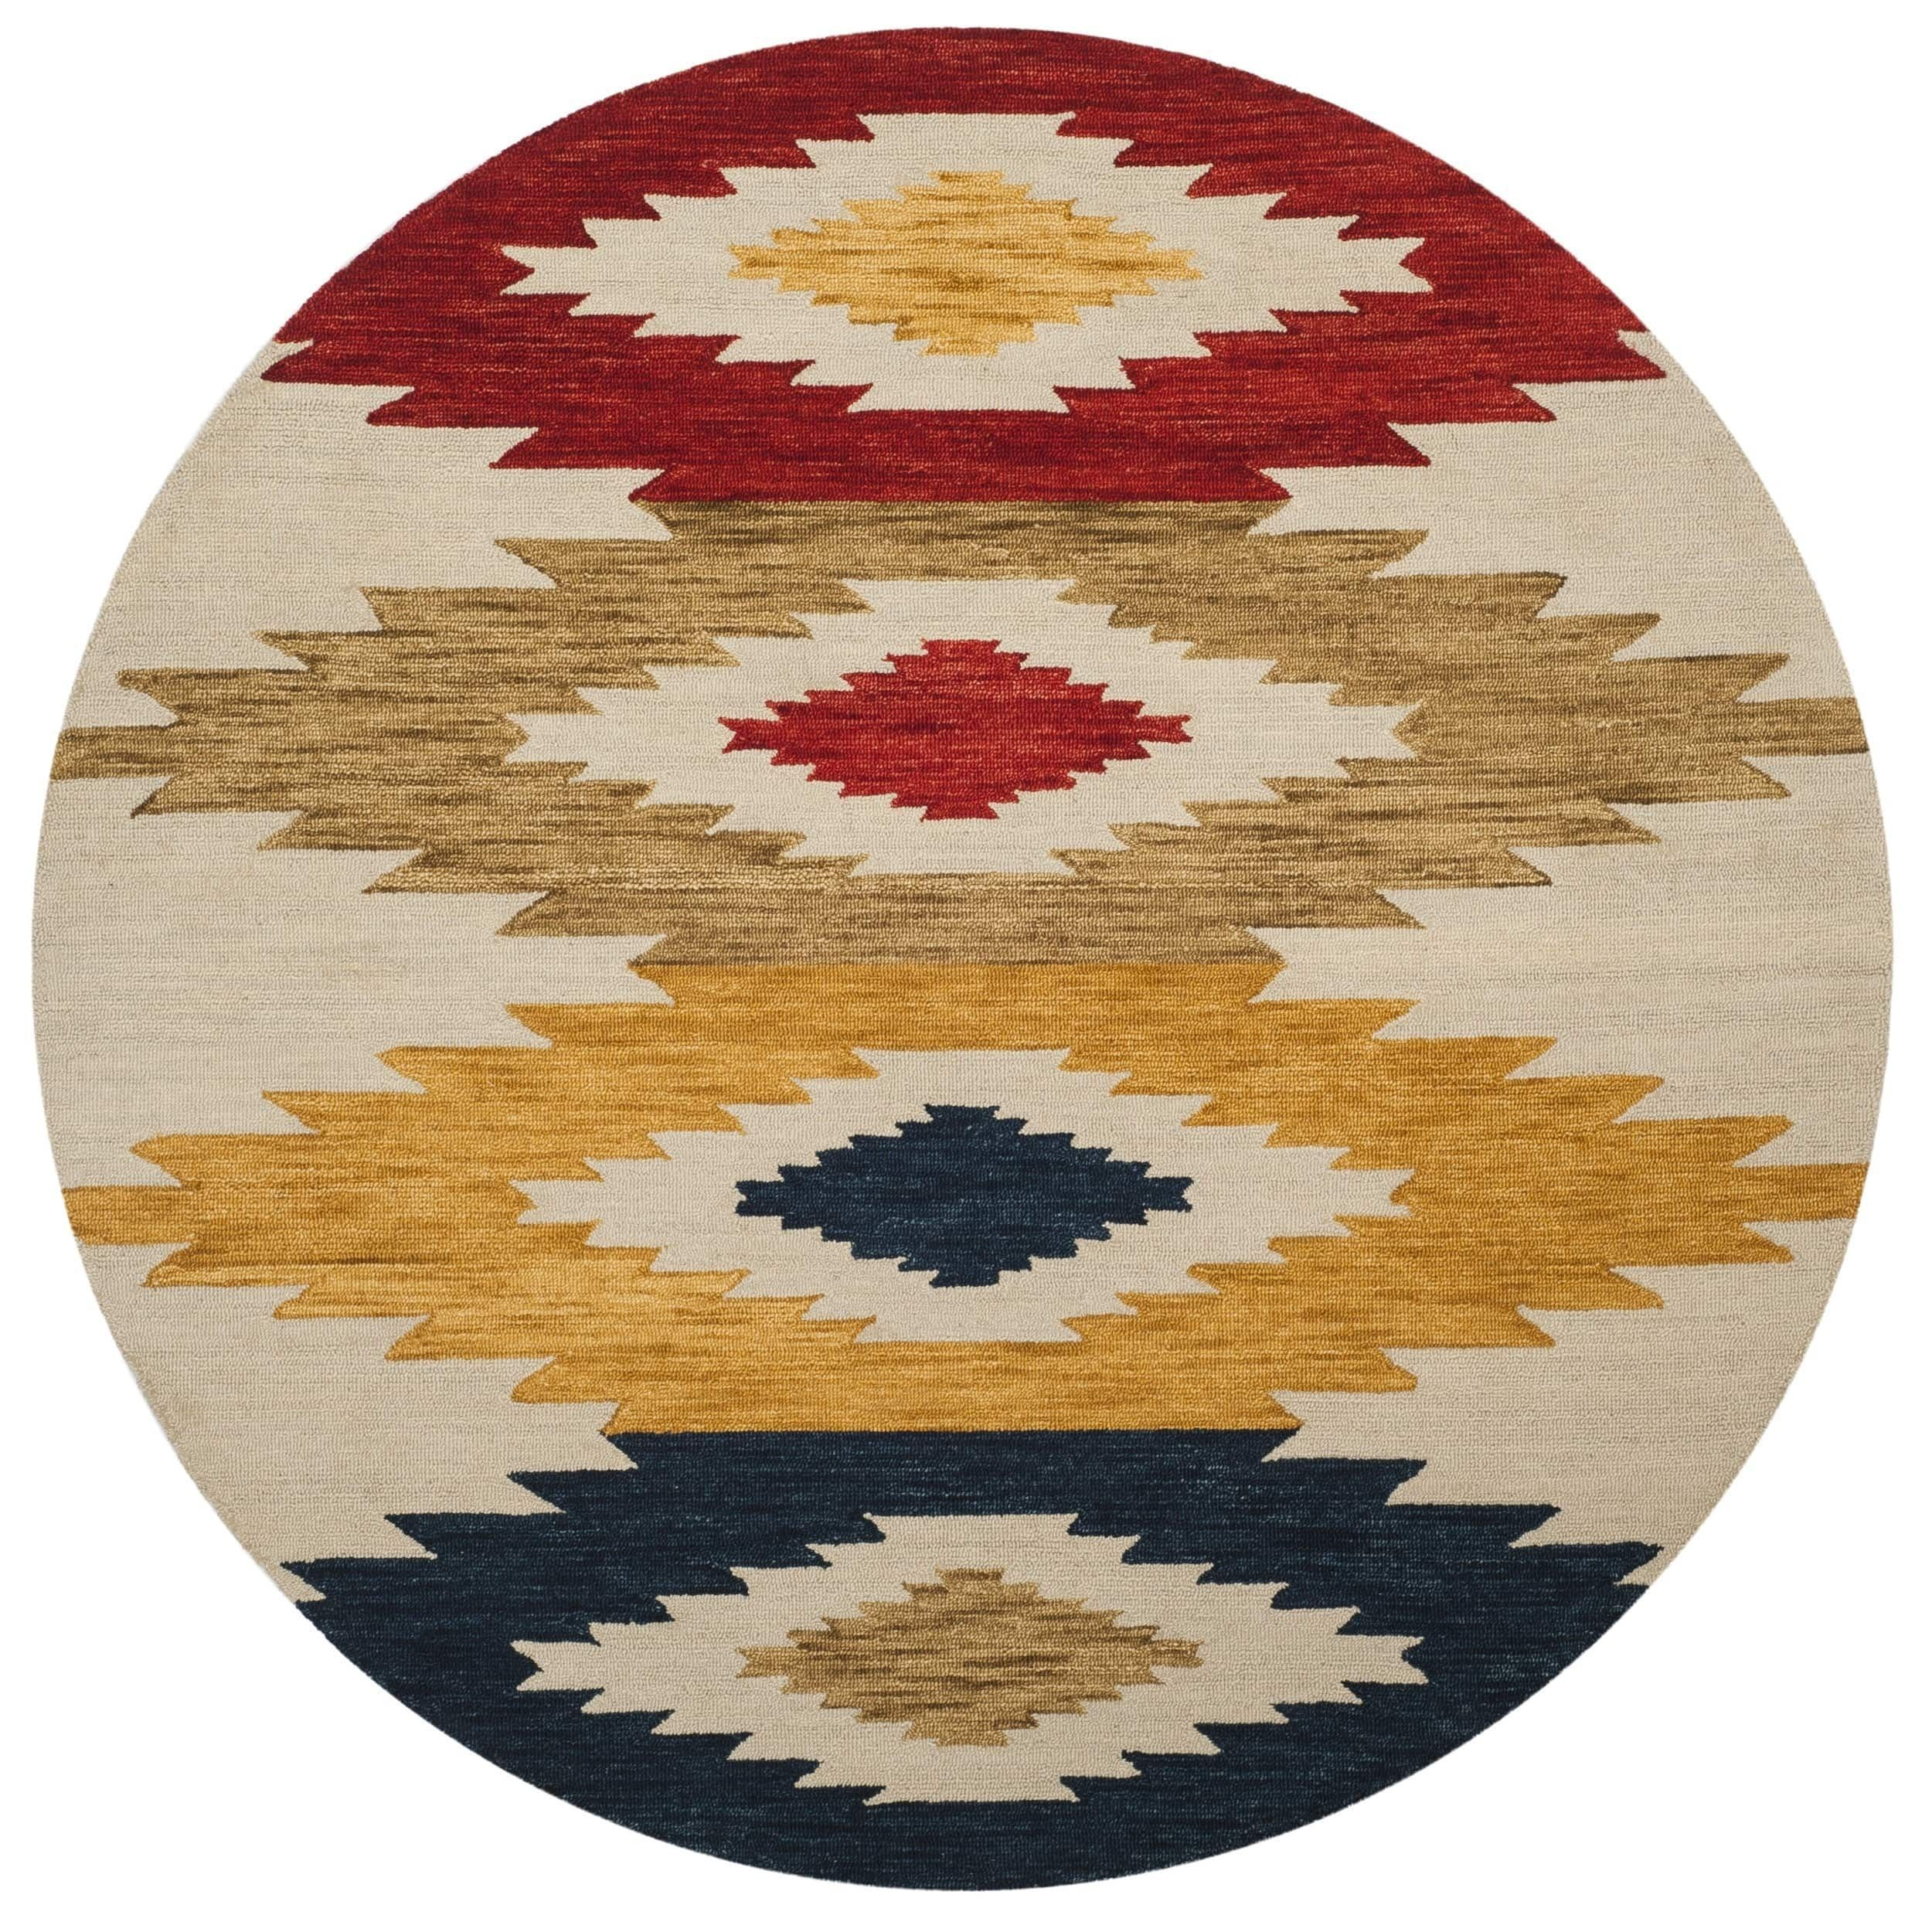 Safavieh Handmade Aspen Velma Boho Tribal Wool Rug Rugs Area